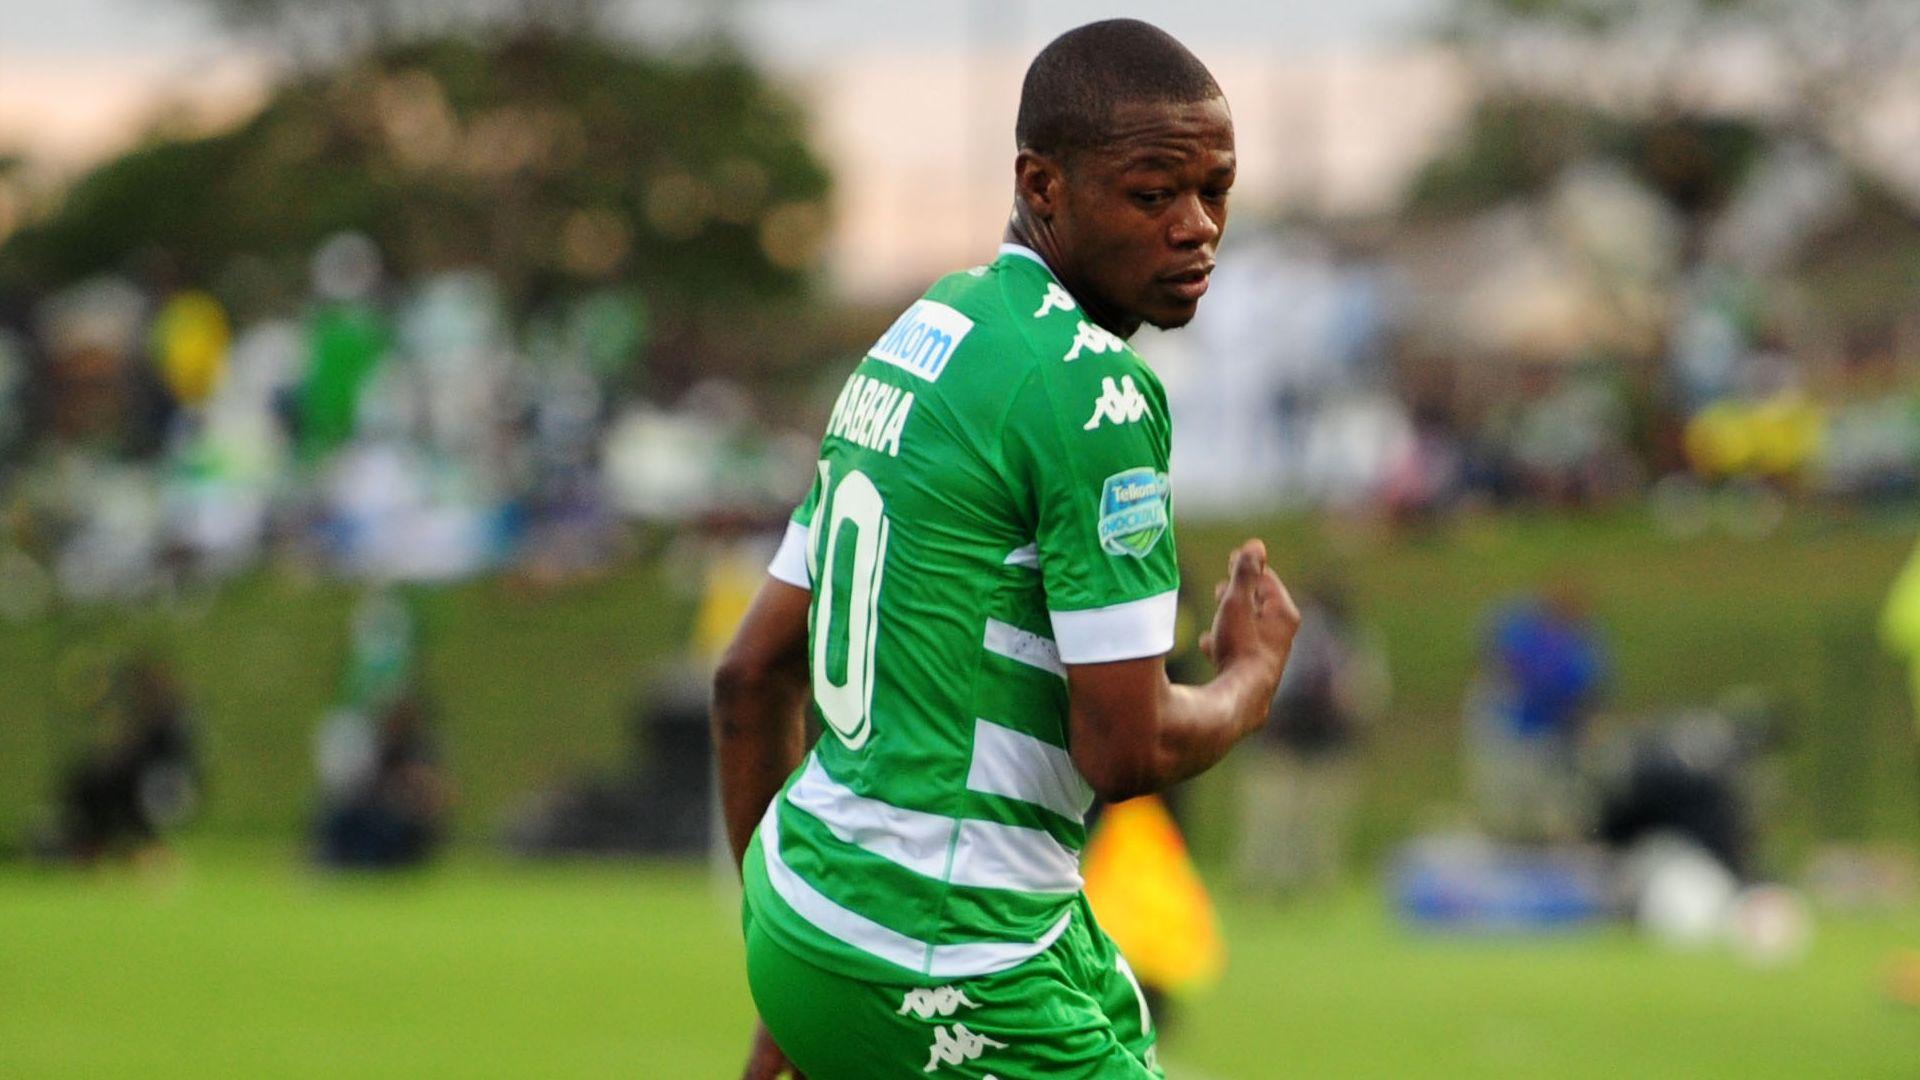 Image result for Ndumiso Mabena - Bloemfontein Celtic